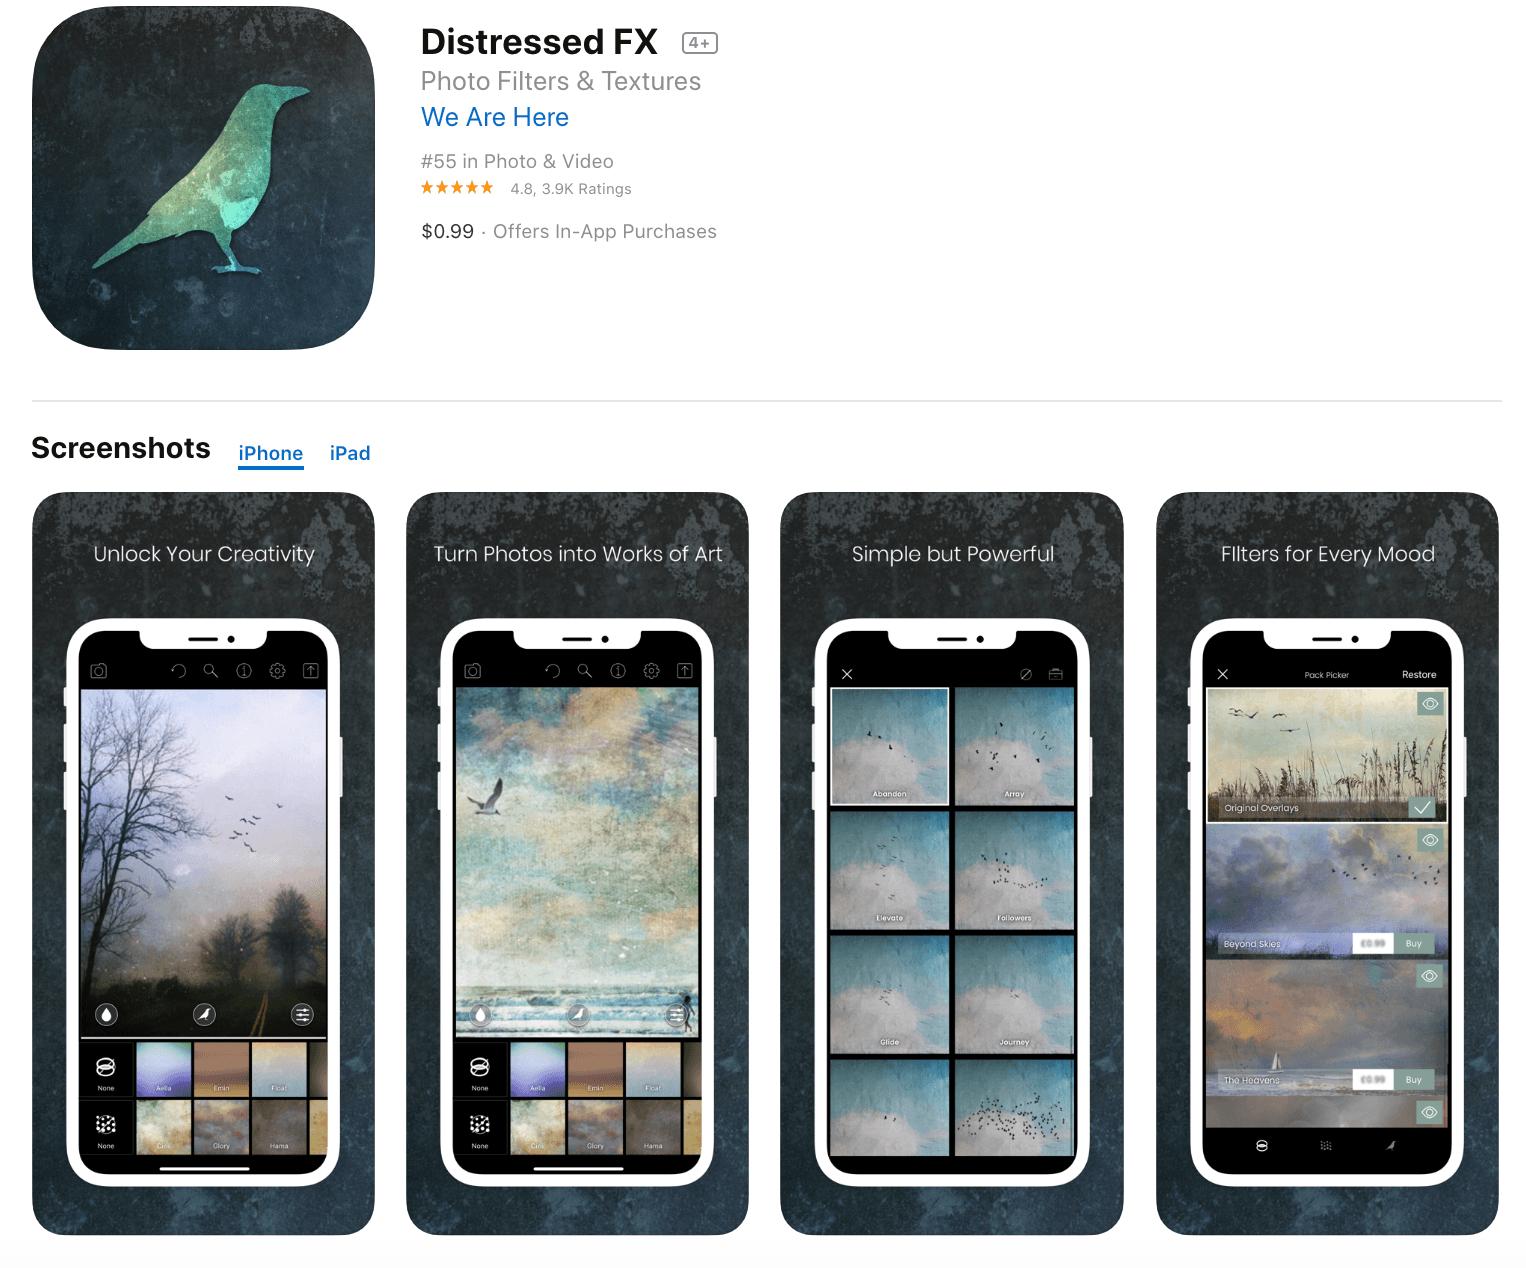 Distressed FX Paid Photo Editor App